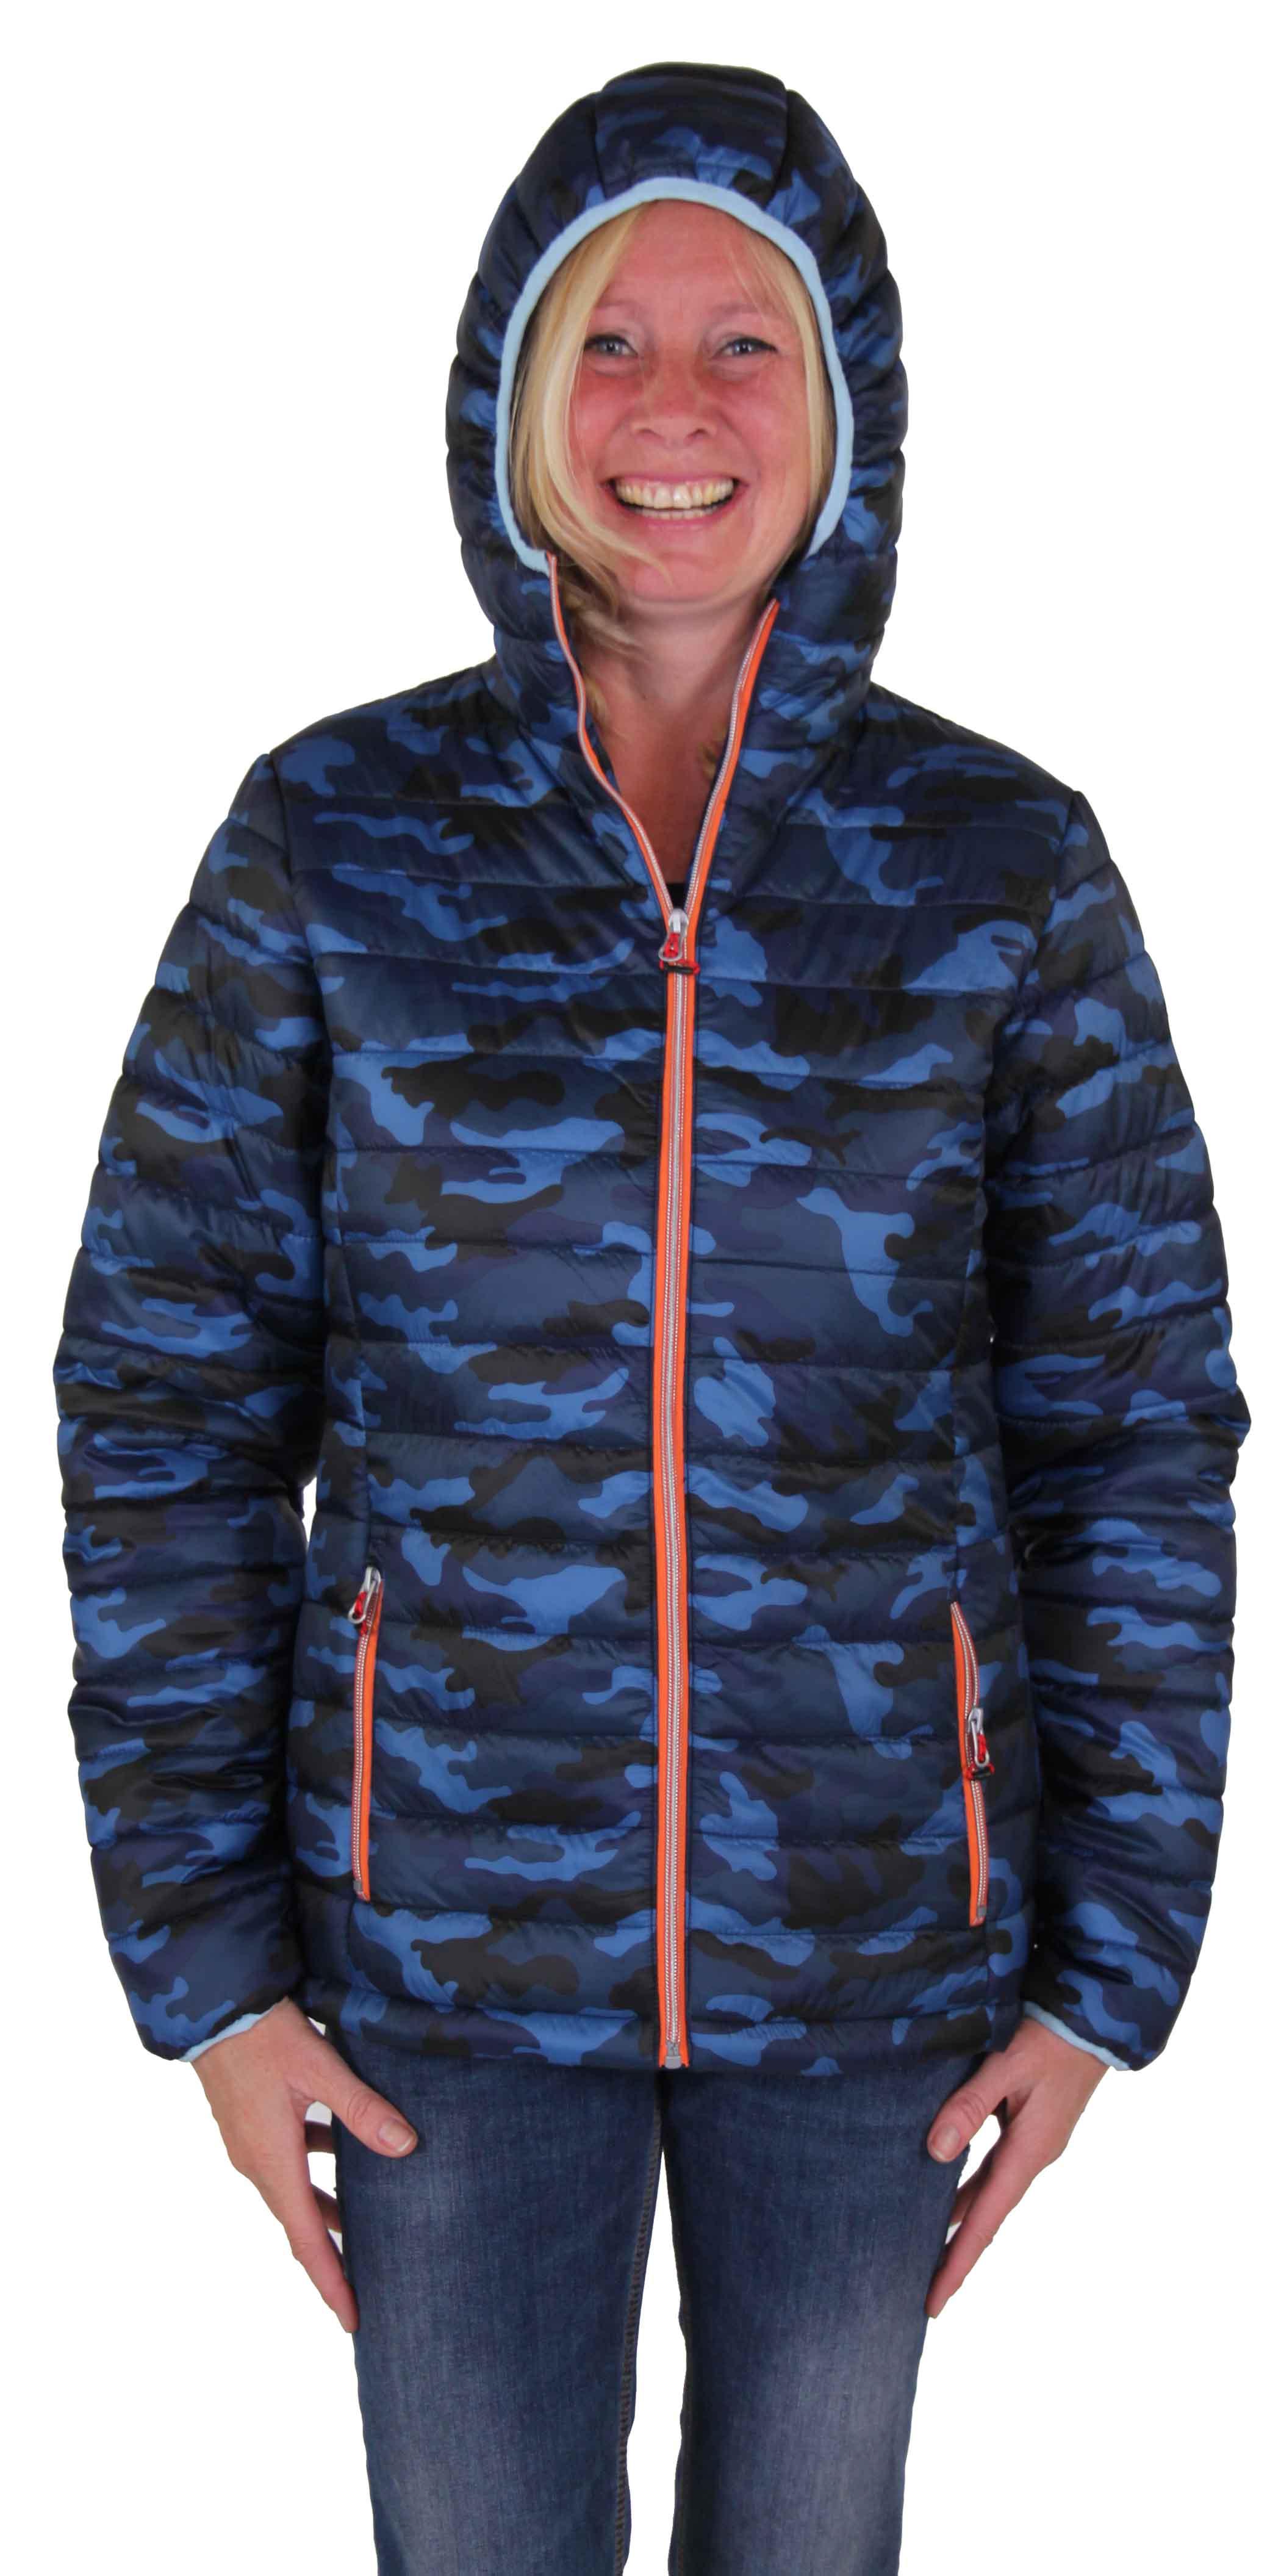 Camouflage Blauwe dames winterjas kopen - Bjornson.nl - Outdoorkleding